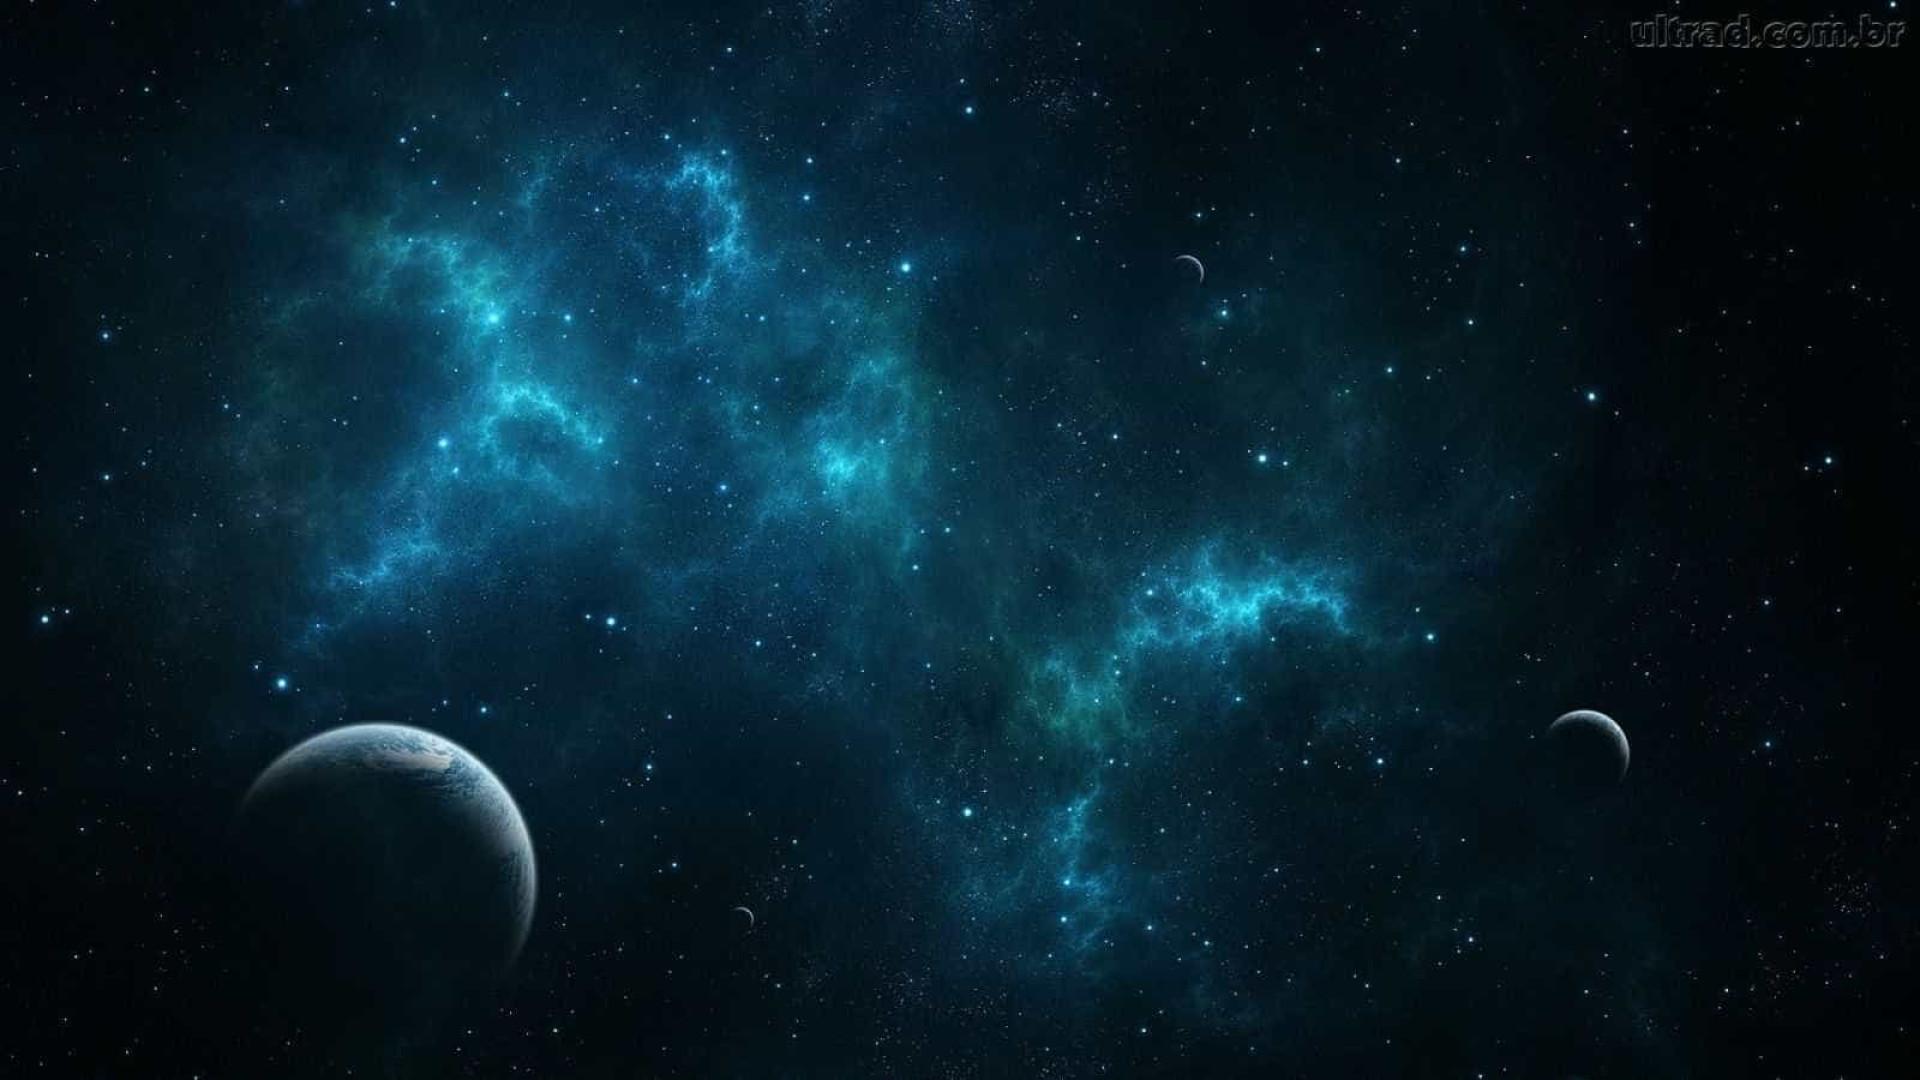 Quer saber mais sobre astronomia?  Baixe este aplicativo